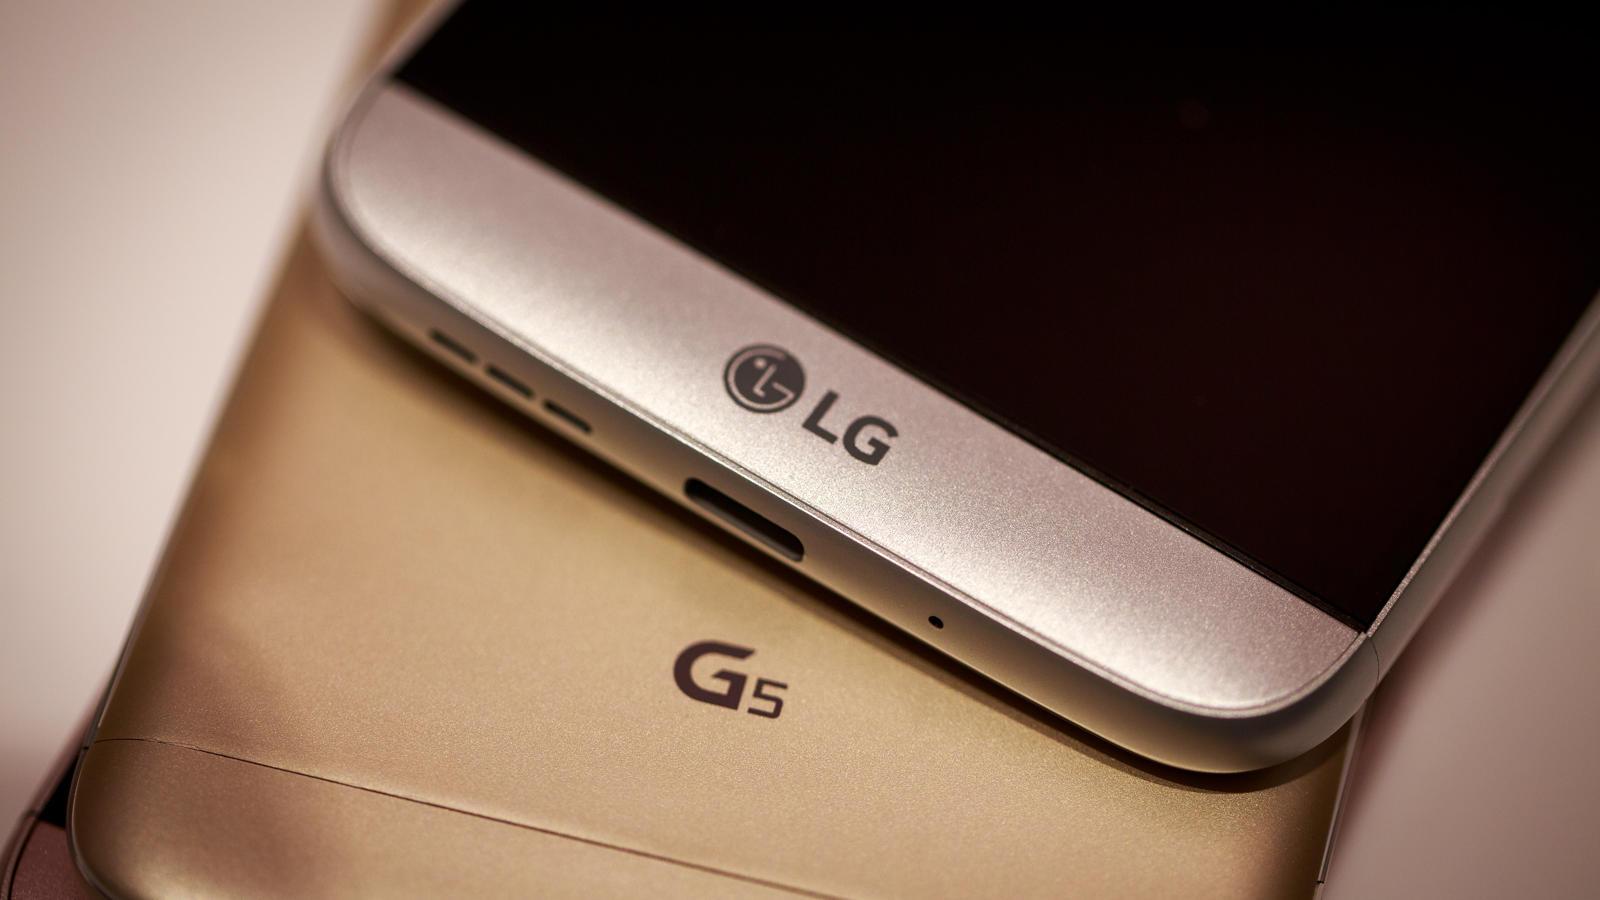 lg-g5-1163-016